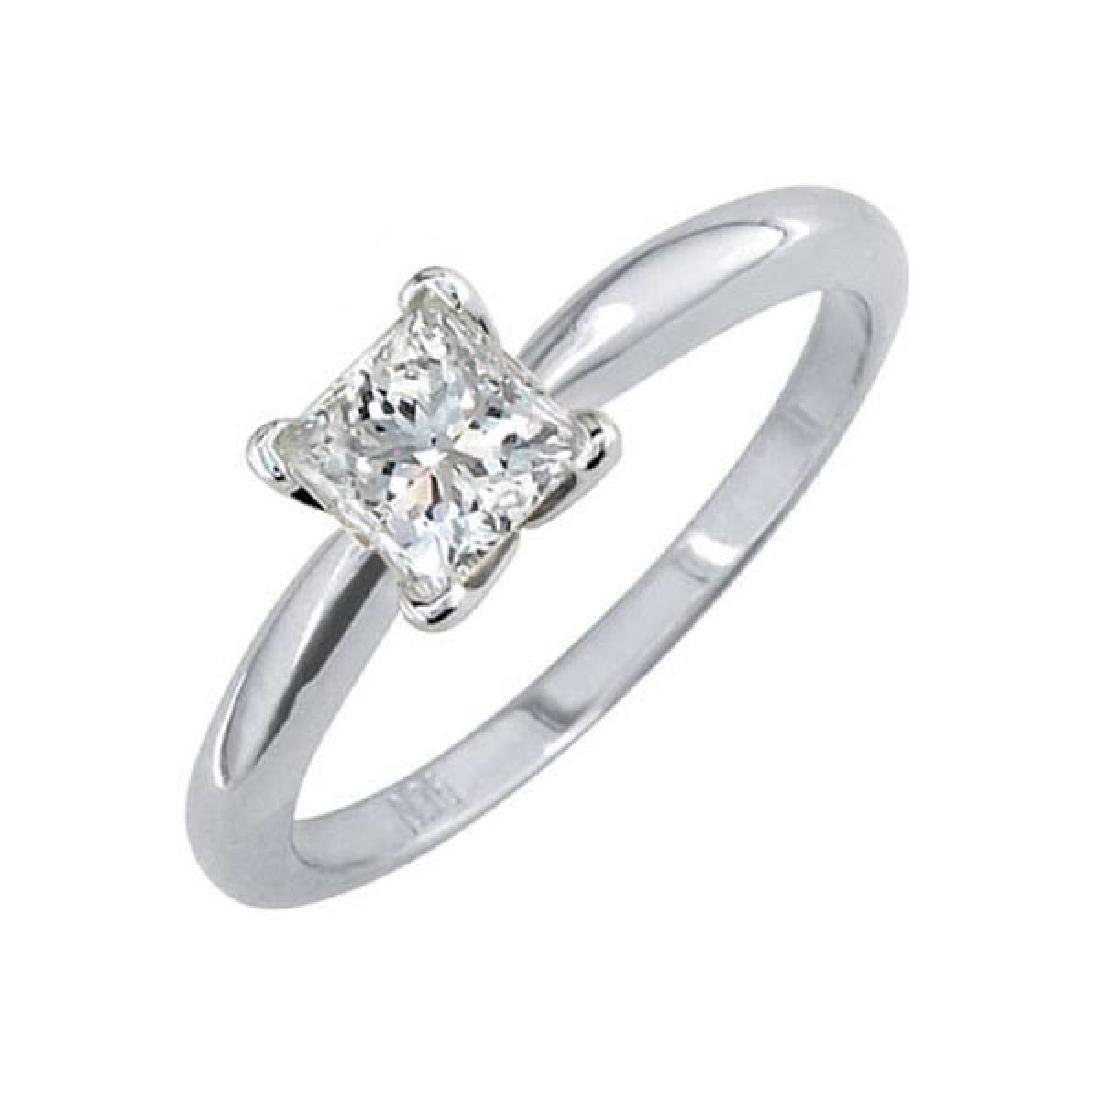 Certified 0.61 CTW Princess Diamond Solitaire 14k Ring